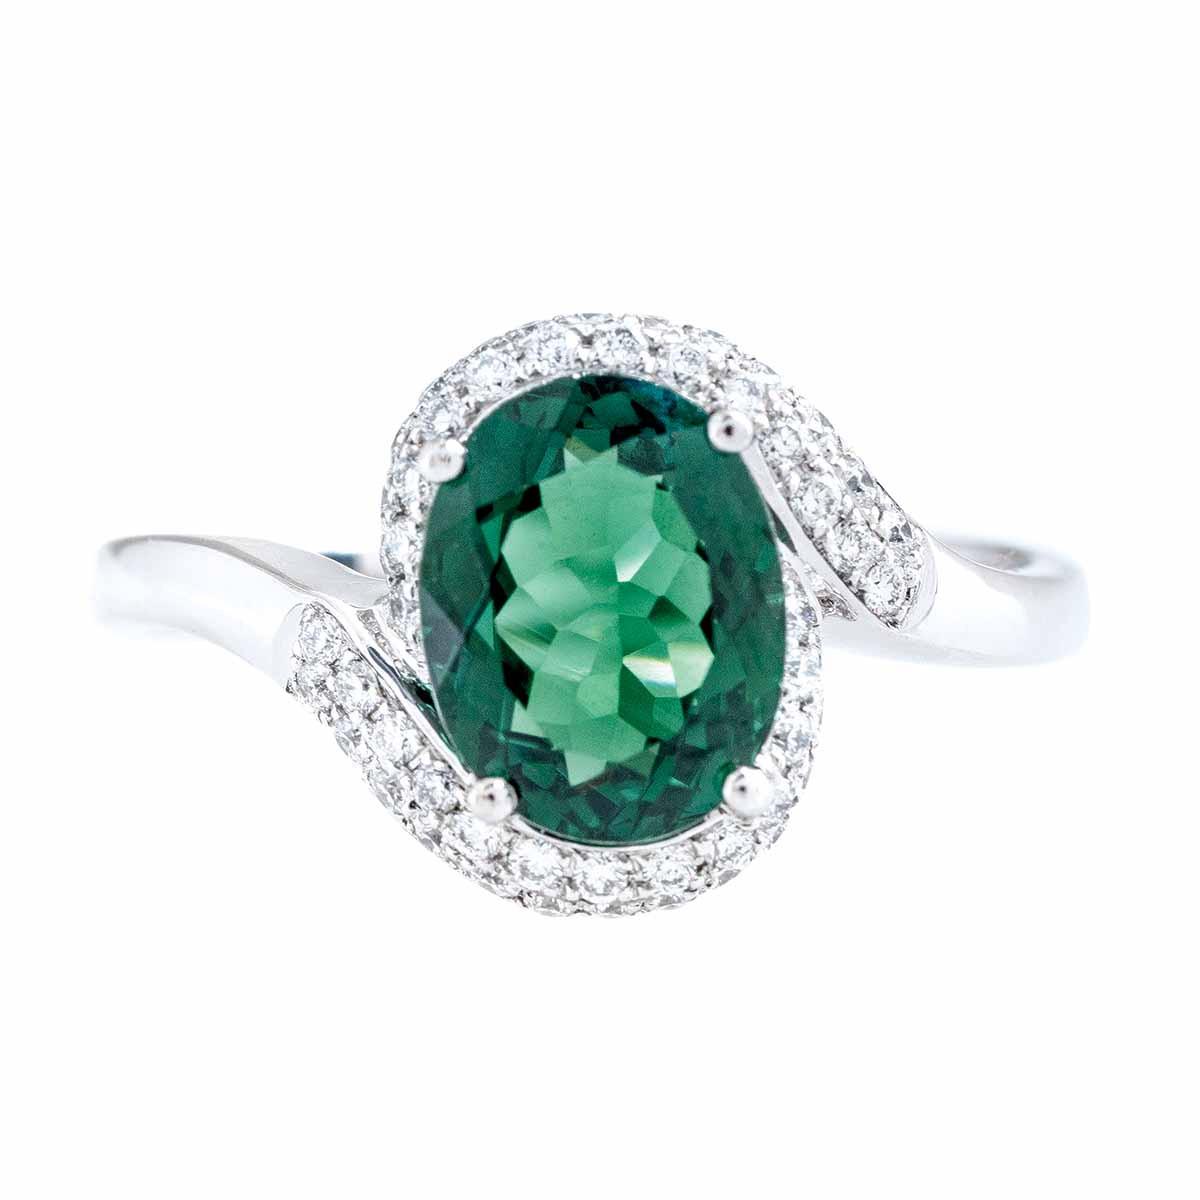 New Asba & Dangler 2.14 CTW Green Tourmaline & Diamond Halo Ring